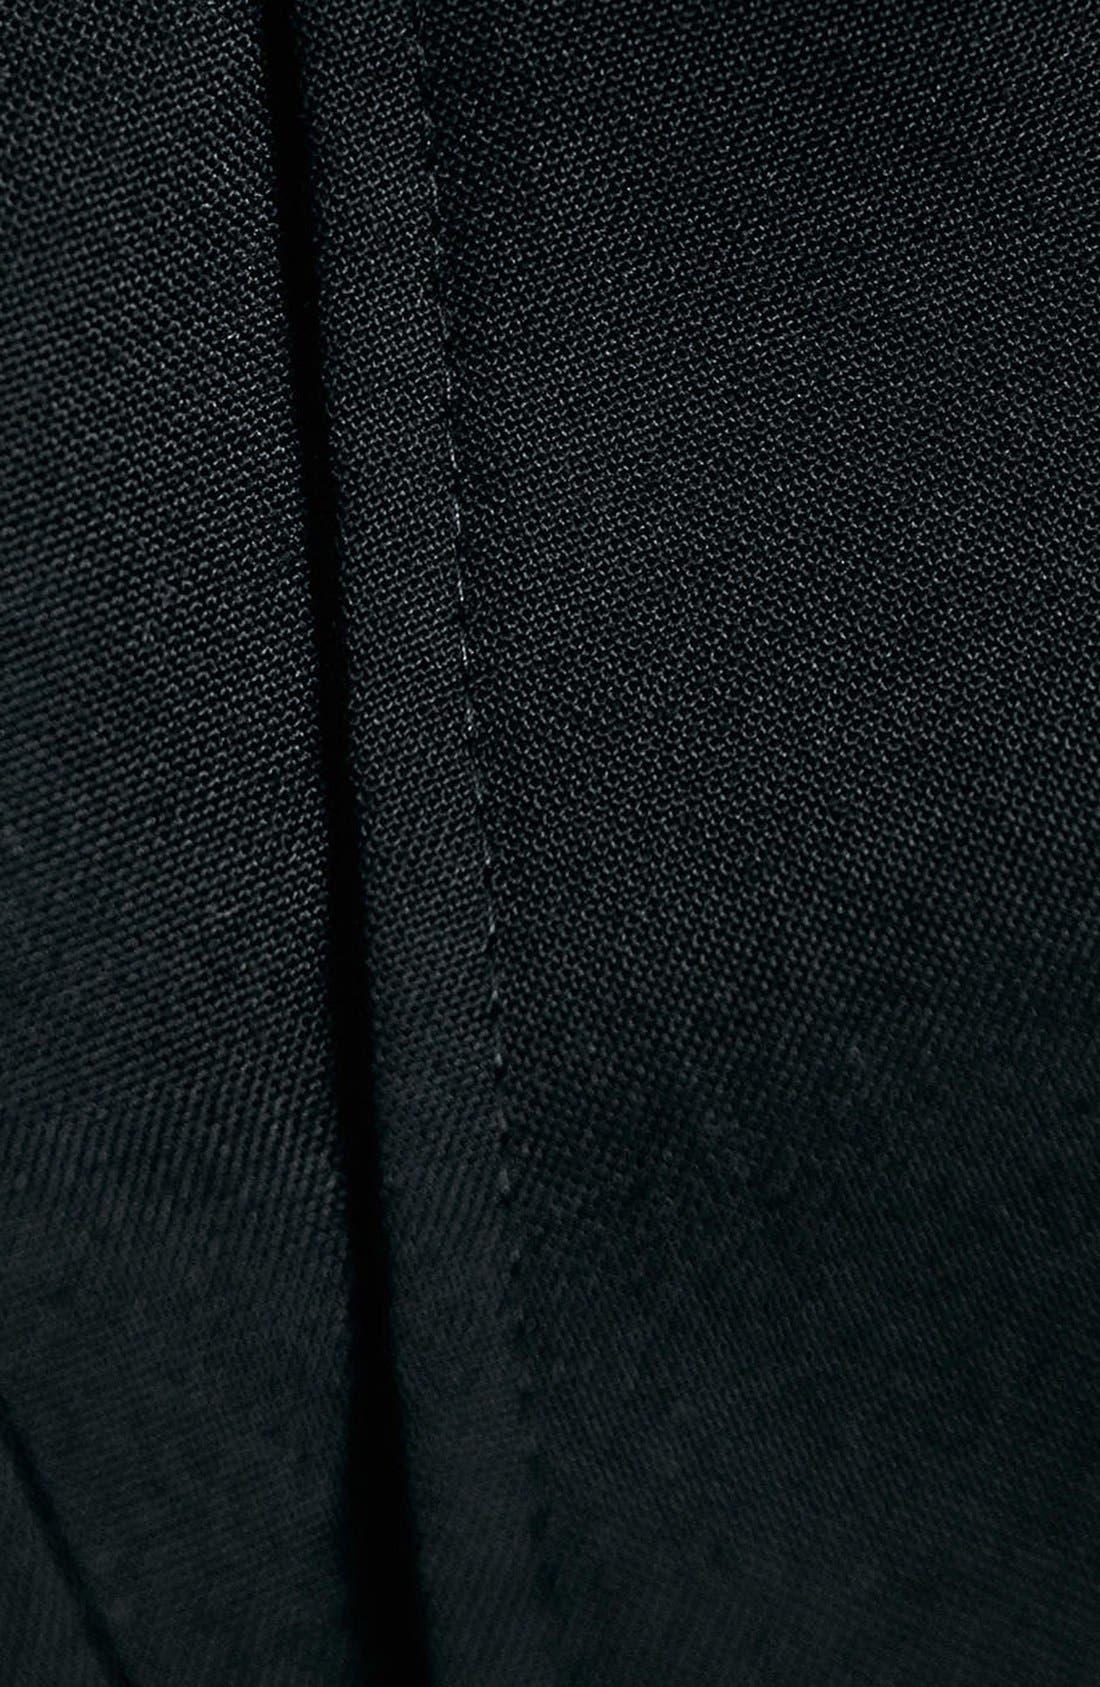 Black Skinny Fit Trousers,                             Alternate thumbnail 4, color,                             001